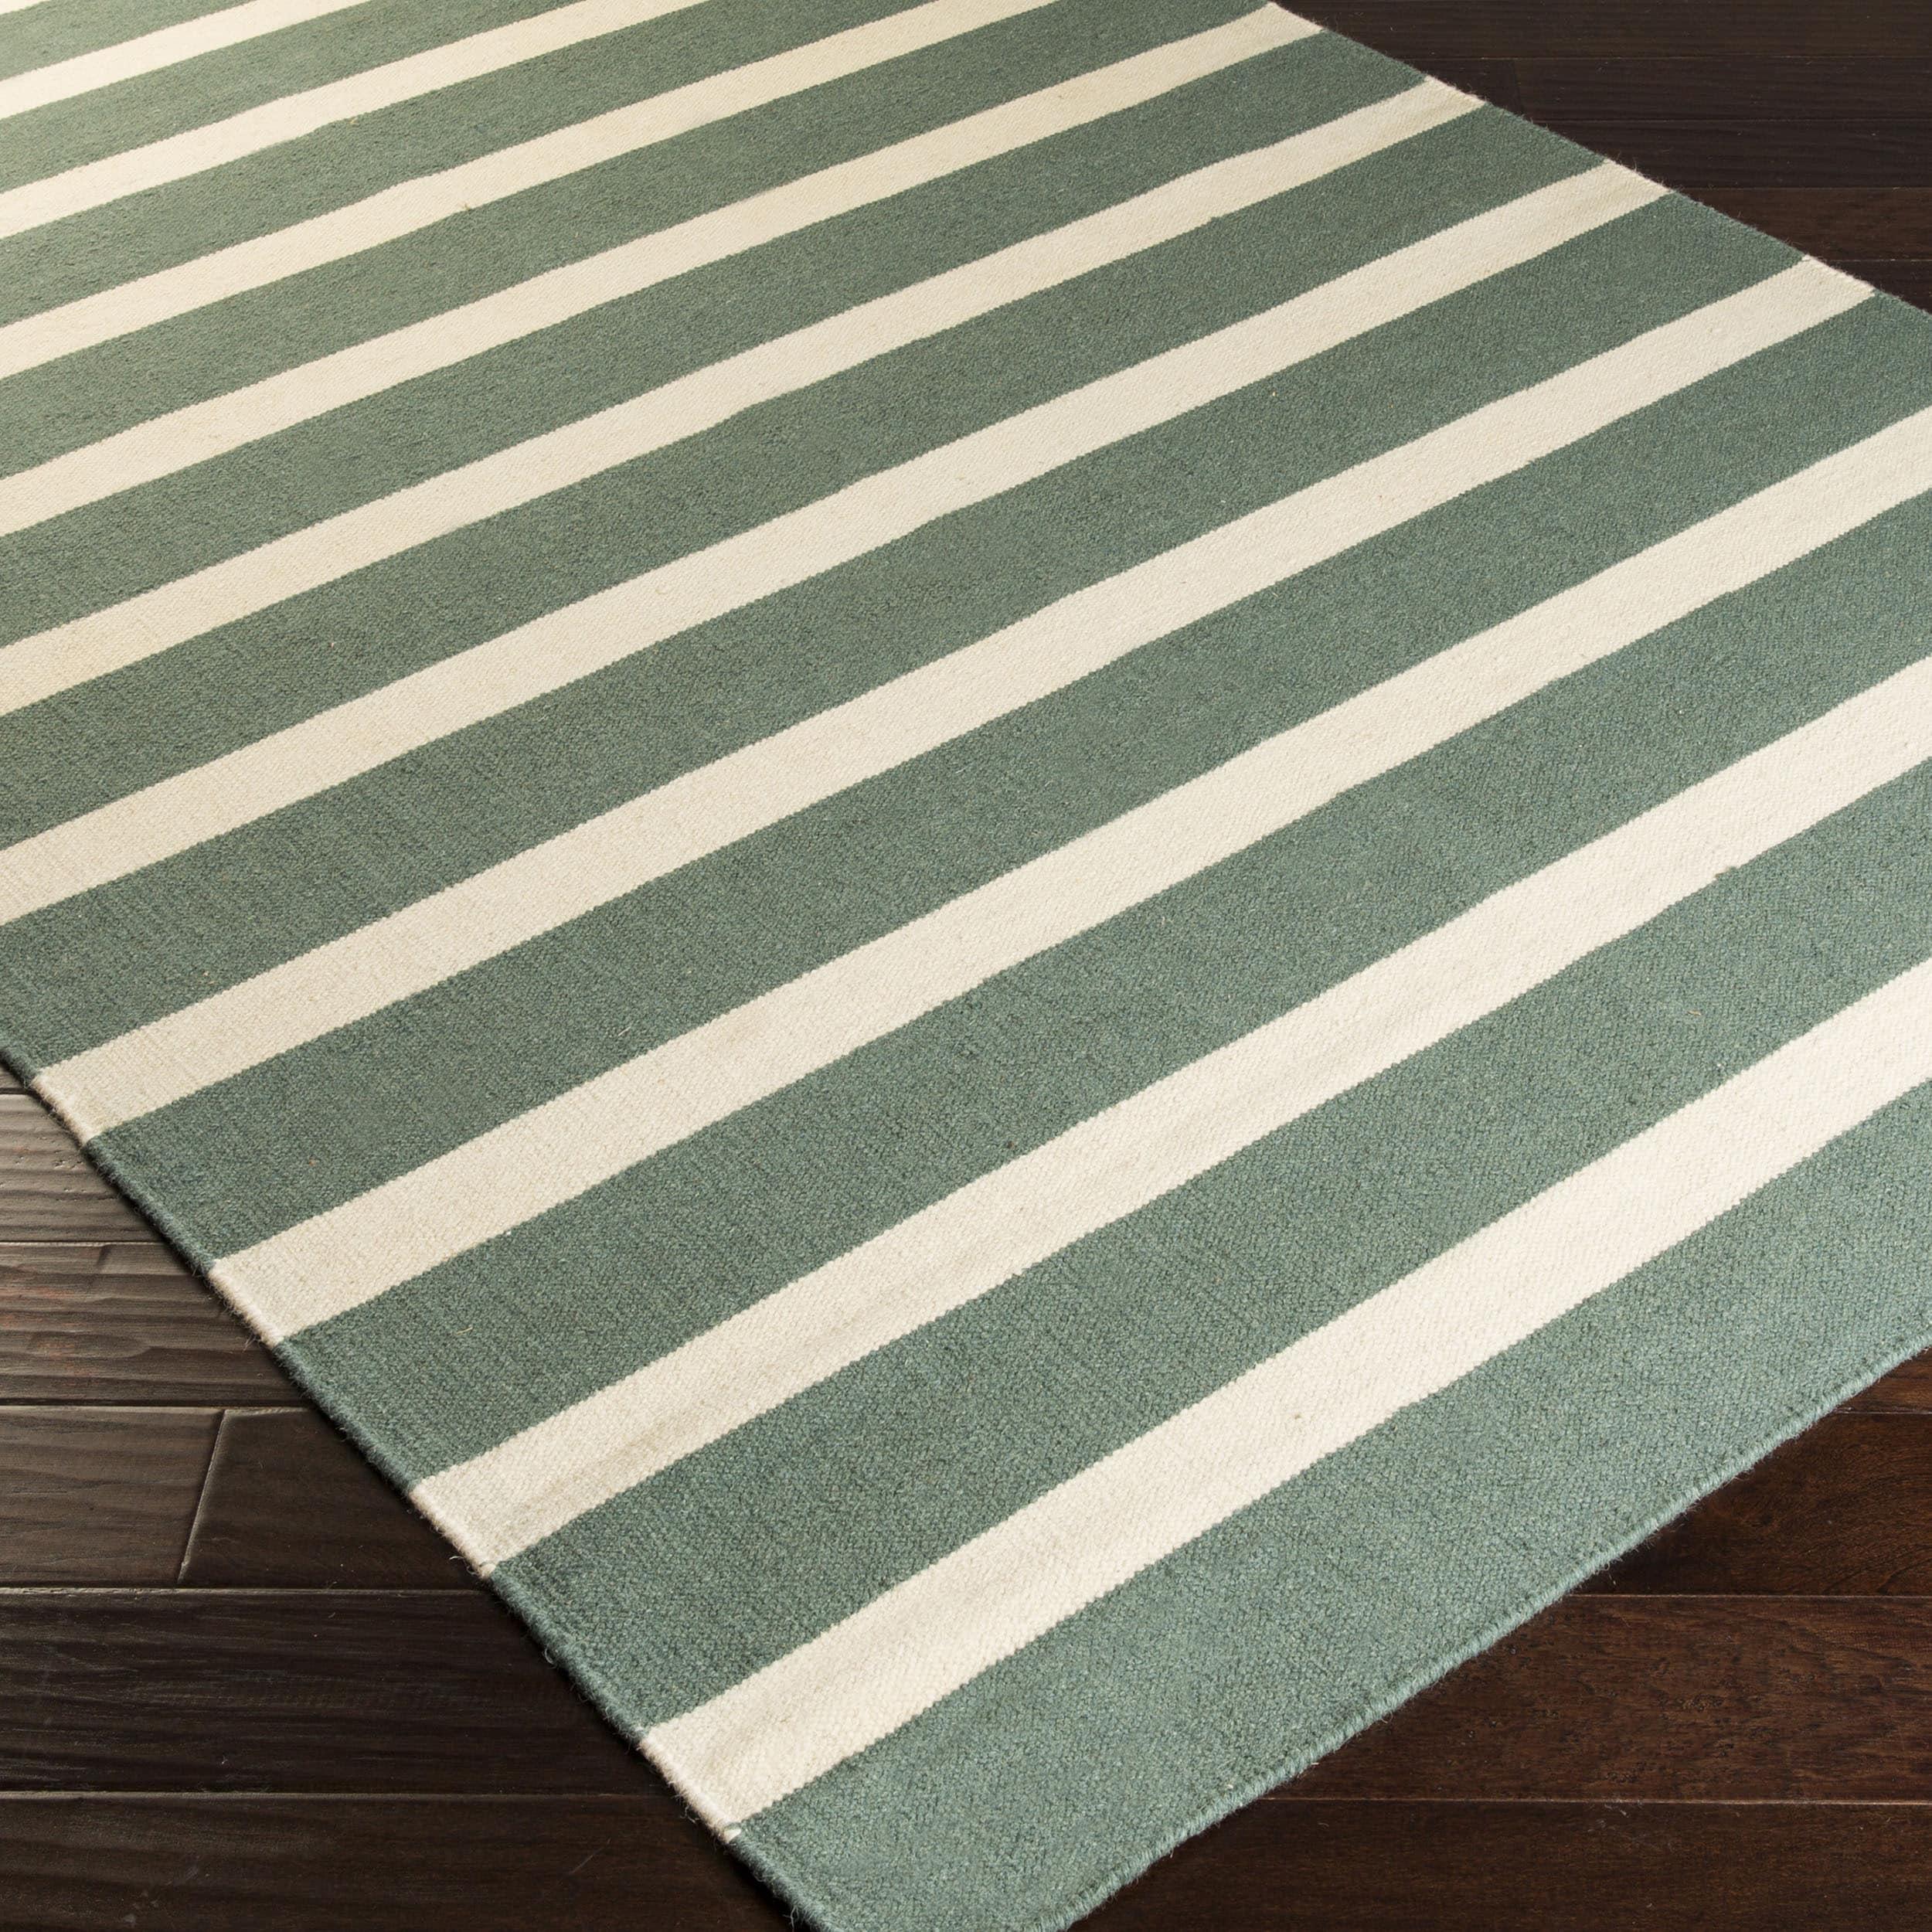 SURYA Huelva Flatweave Striped Runner (2'6 x 8') (Green -...